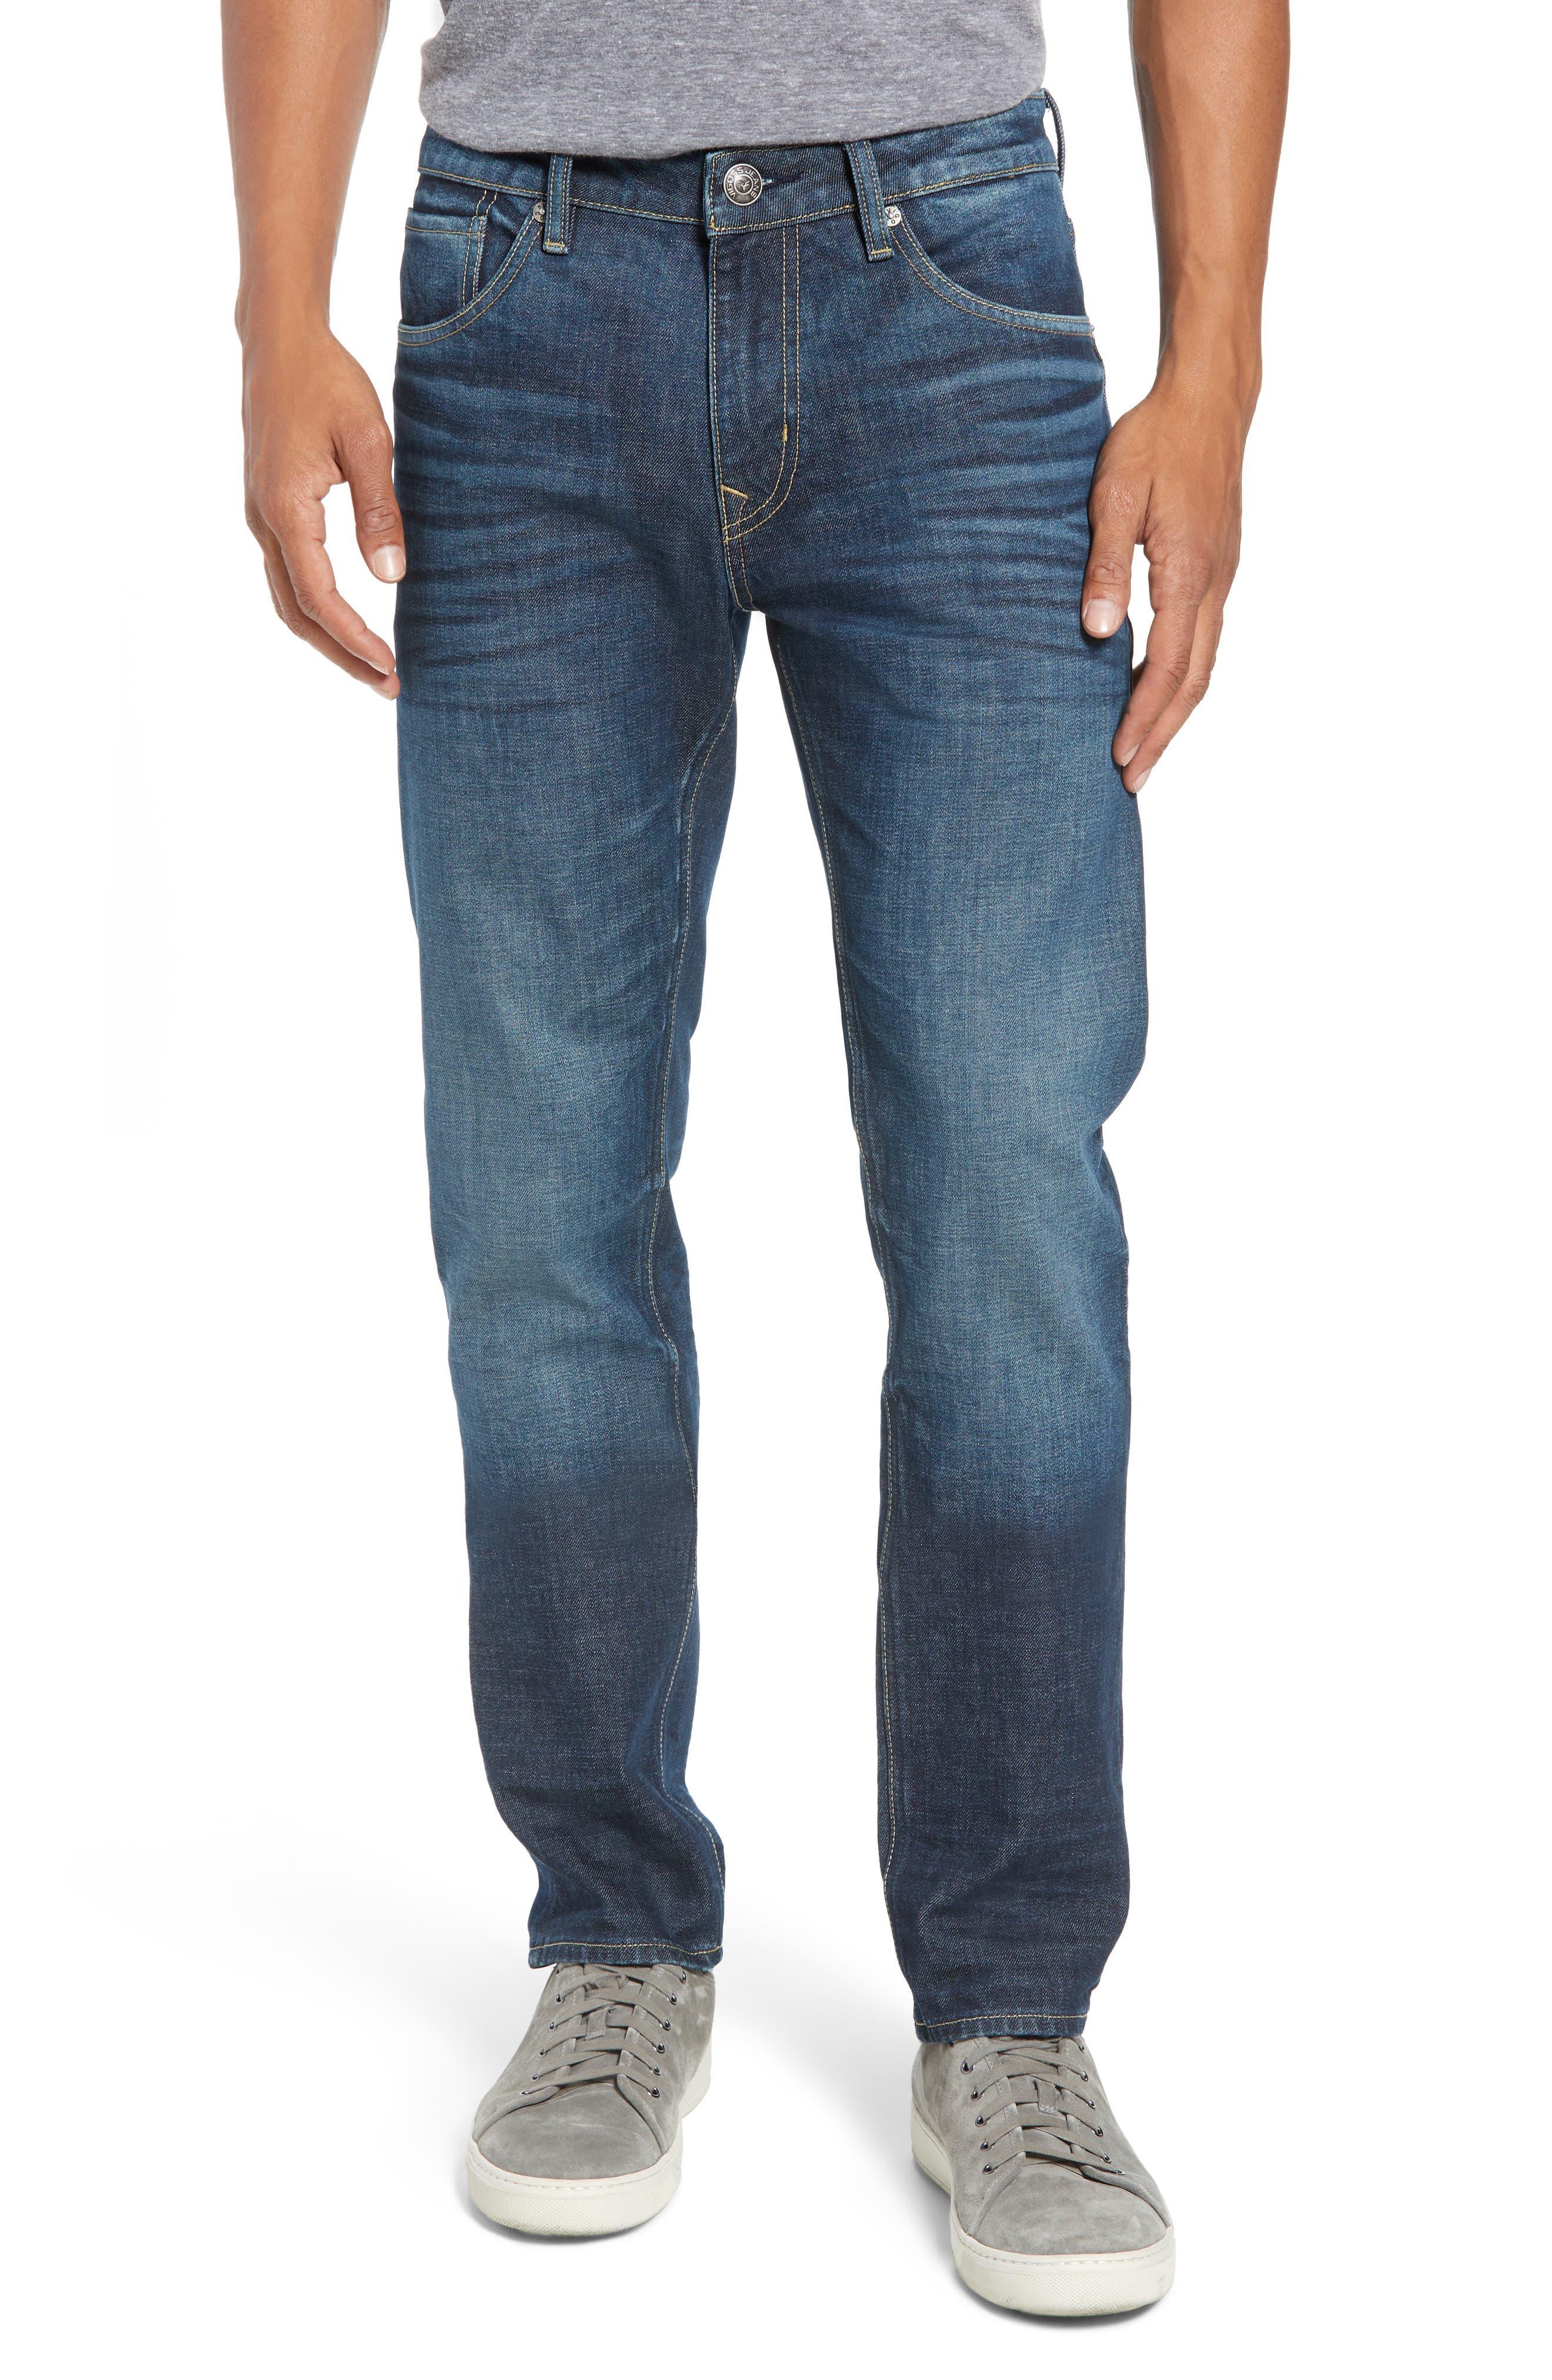 Mick Slim Fit Jeans,                         Main,                         color, DARK 3D WASH